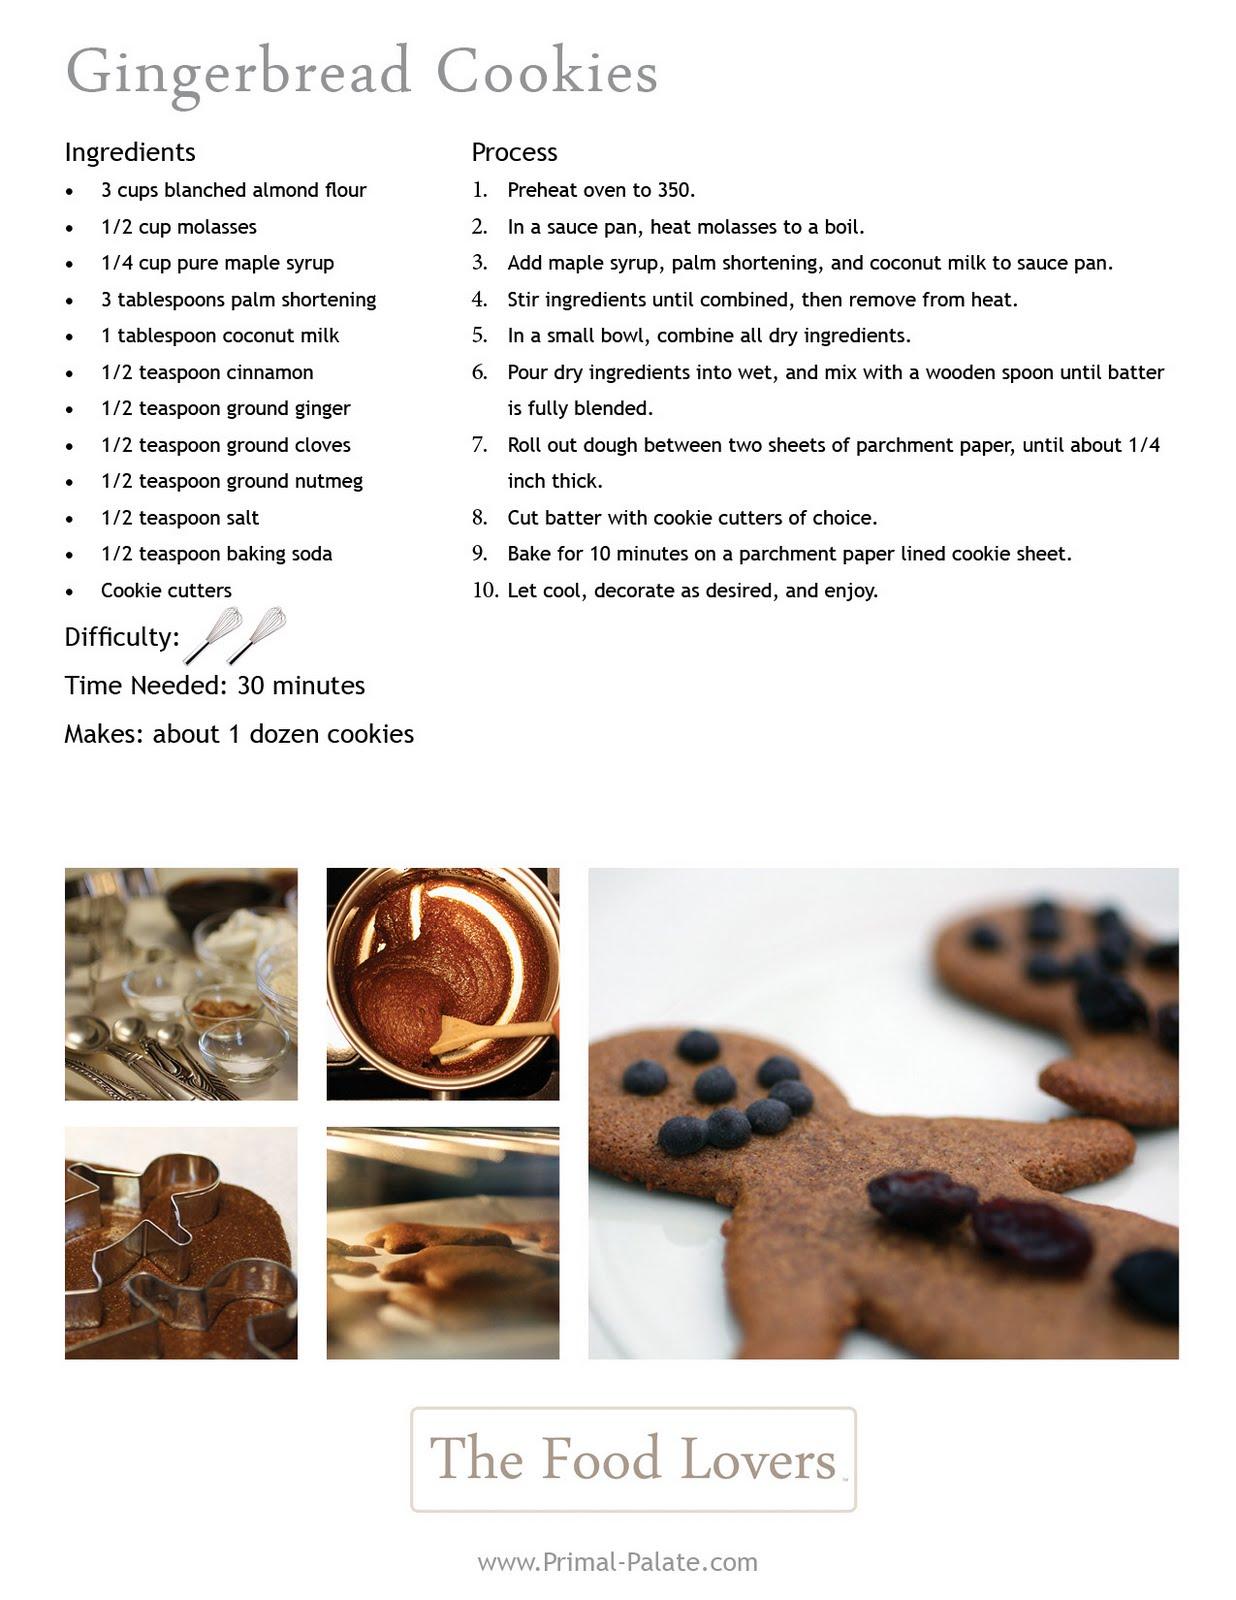 Paleo Christmas Cookies: Grain-Free Gingerbread Men - Primal ...